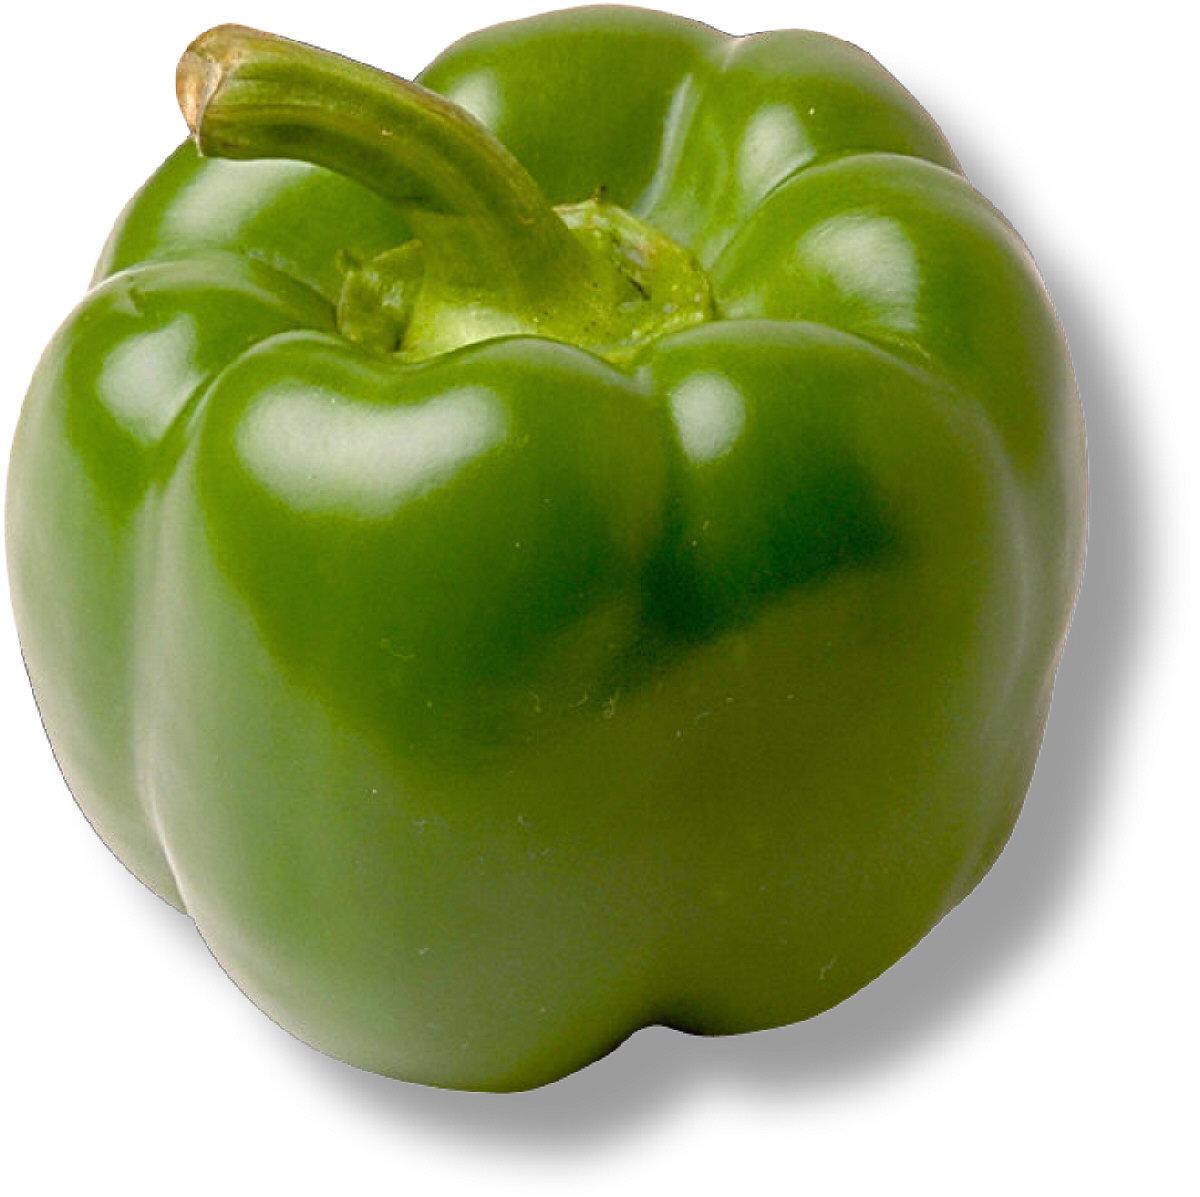 Howdy Ya Dewit!: Greeting Card Campaign: 8-05 Green Pepper Day